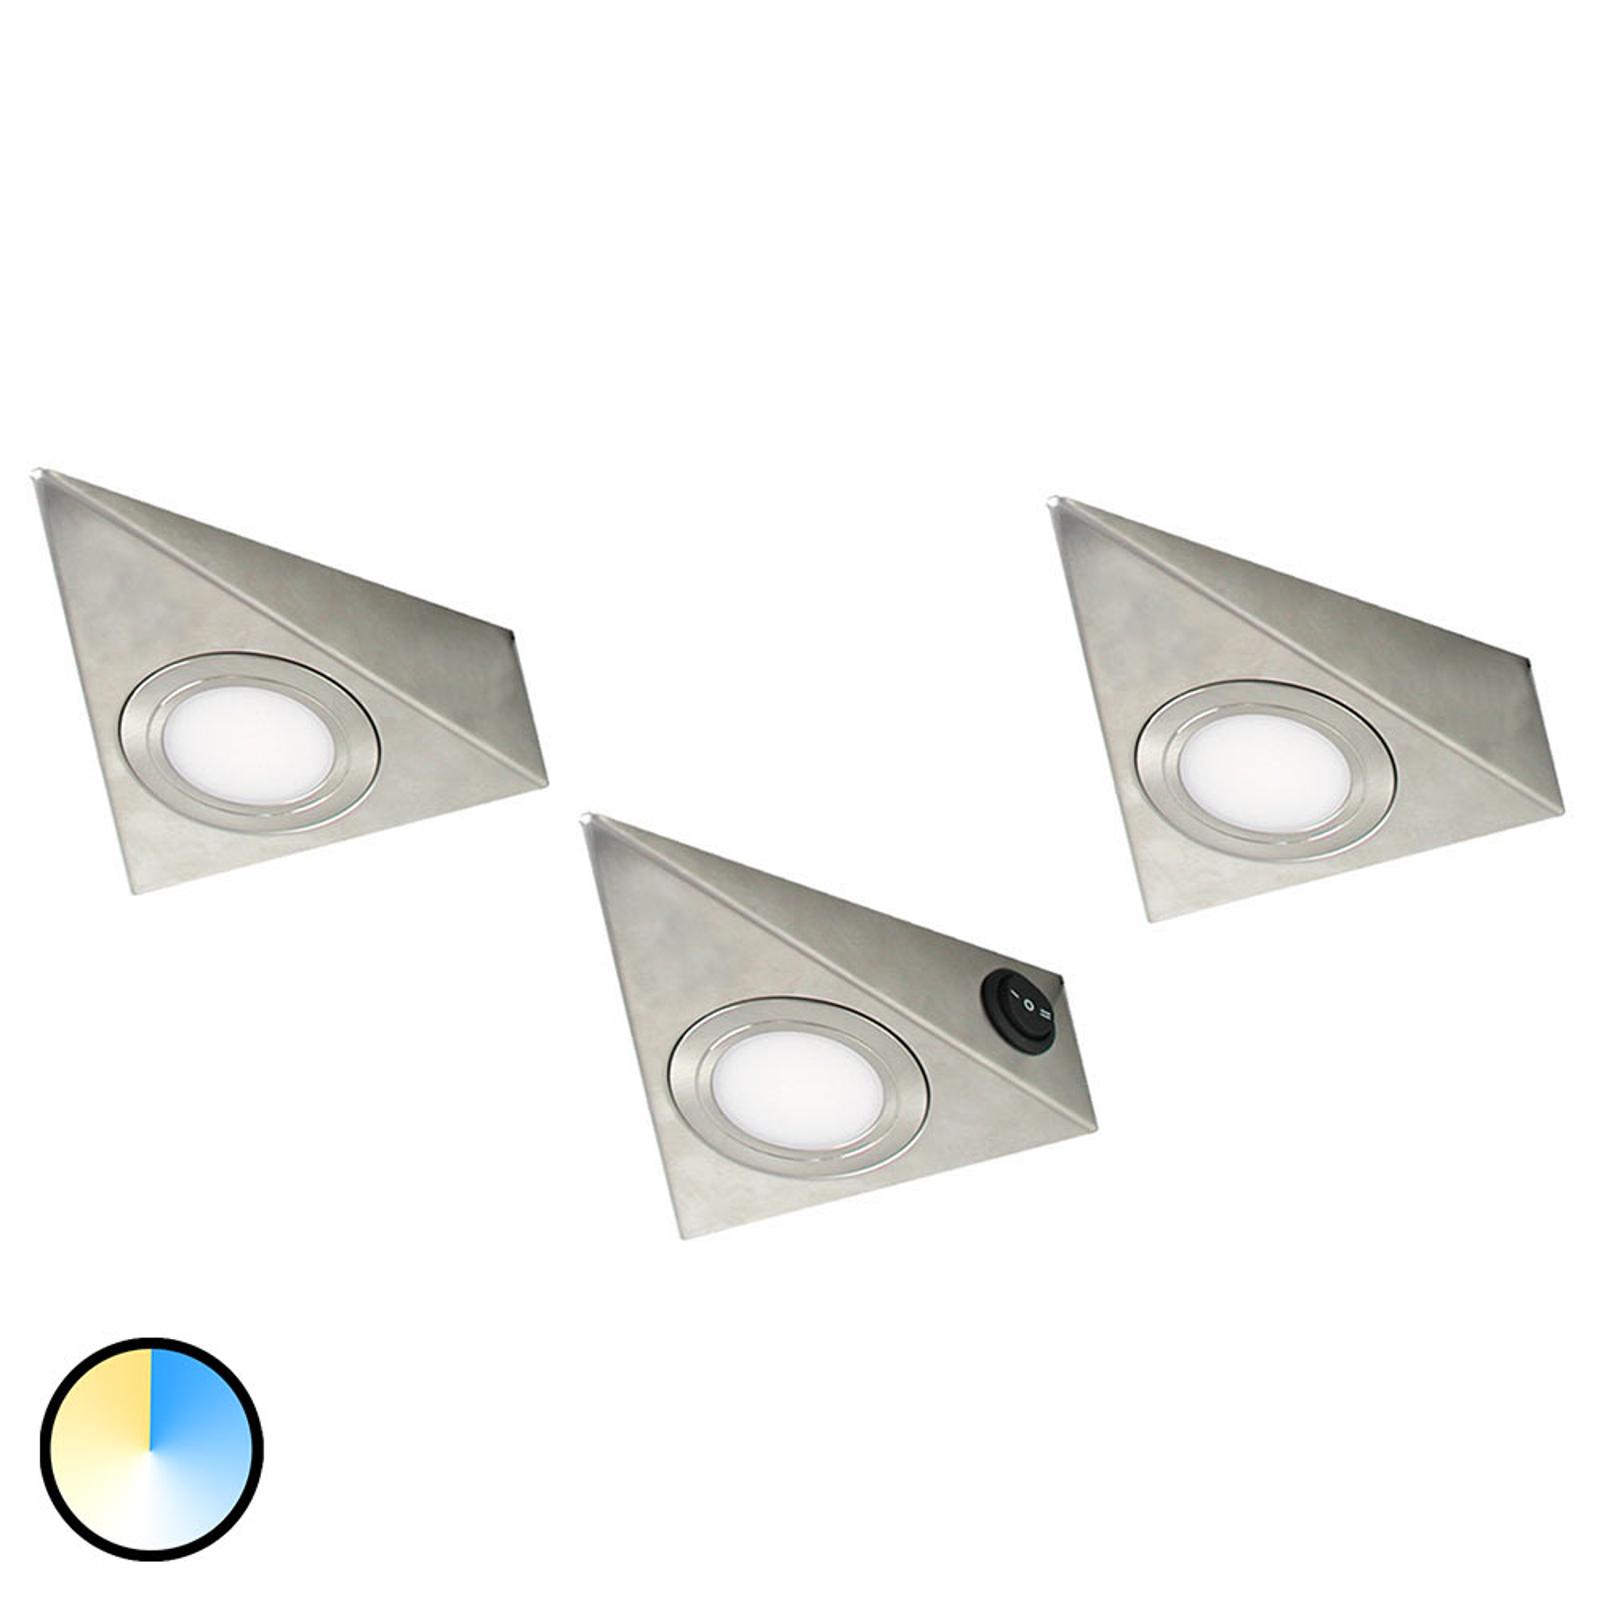 Lampada LED per mobili triangolare CS, set da 3